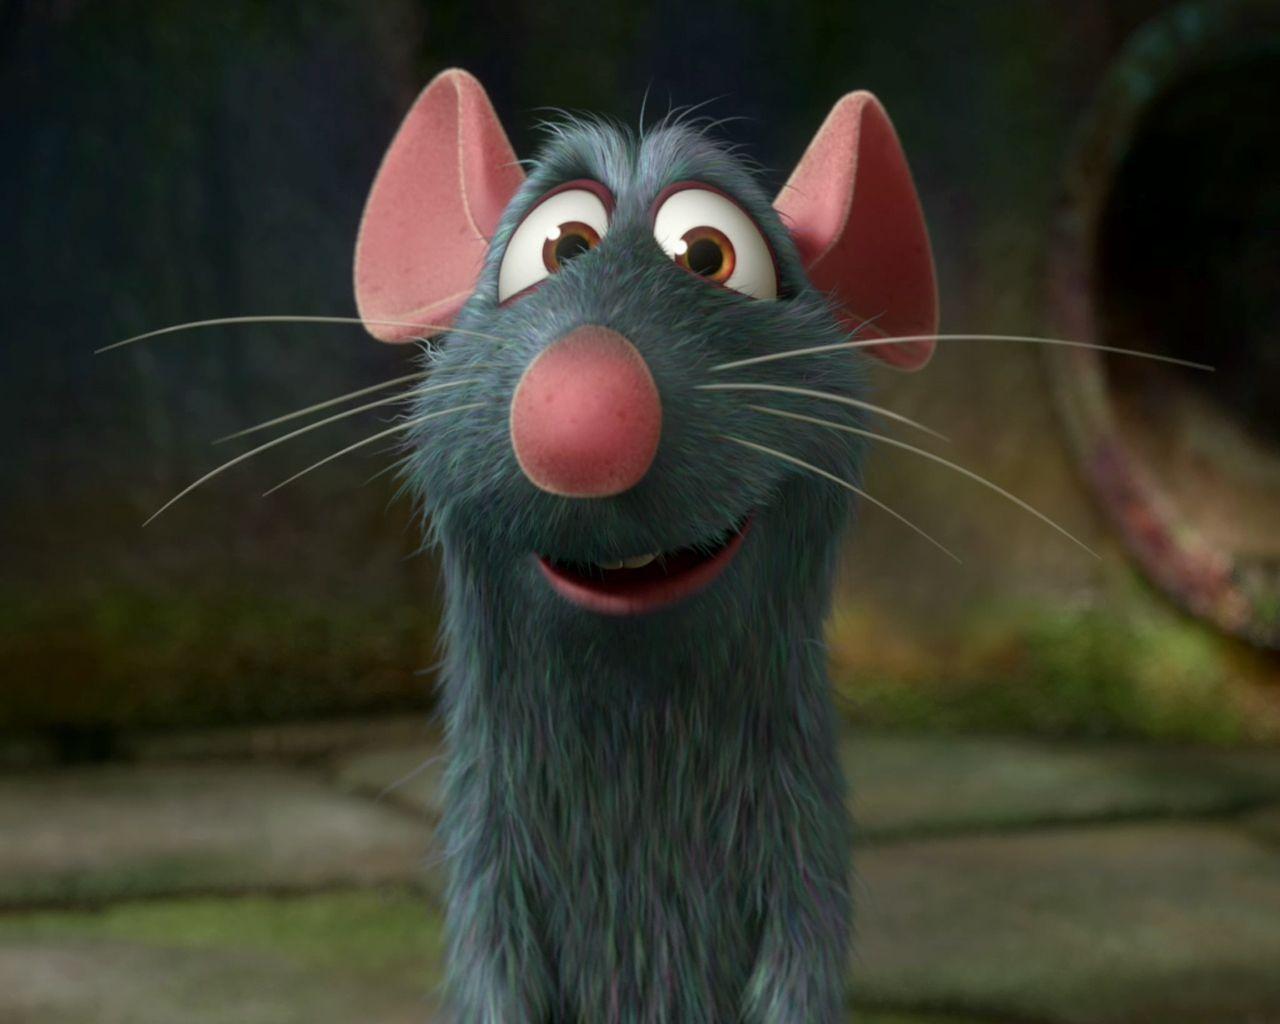 Ratatouille Photo: Ratatouille